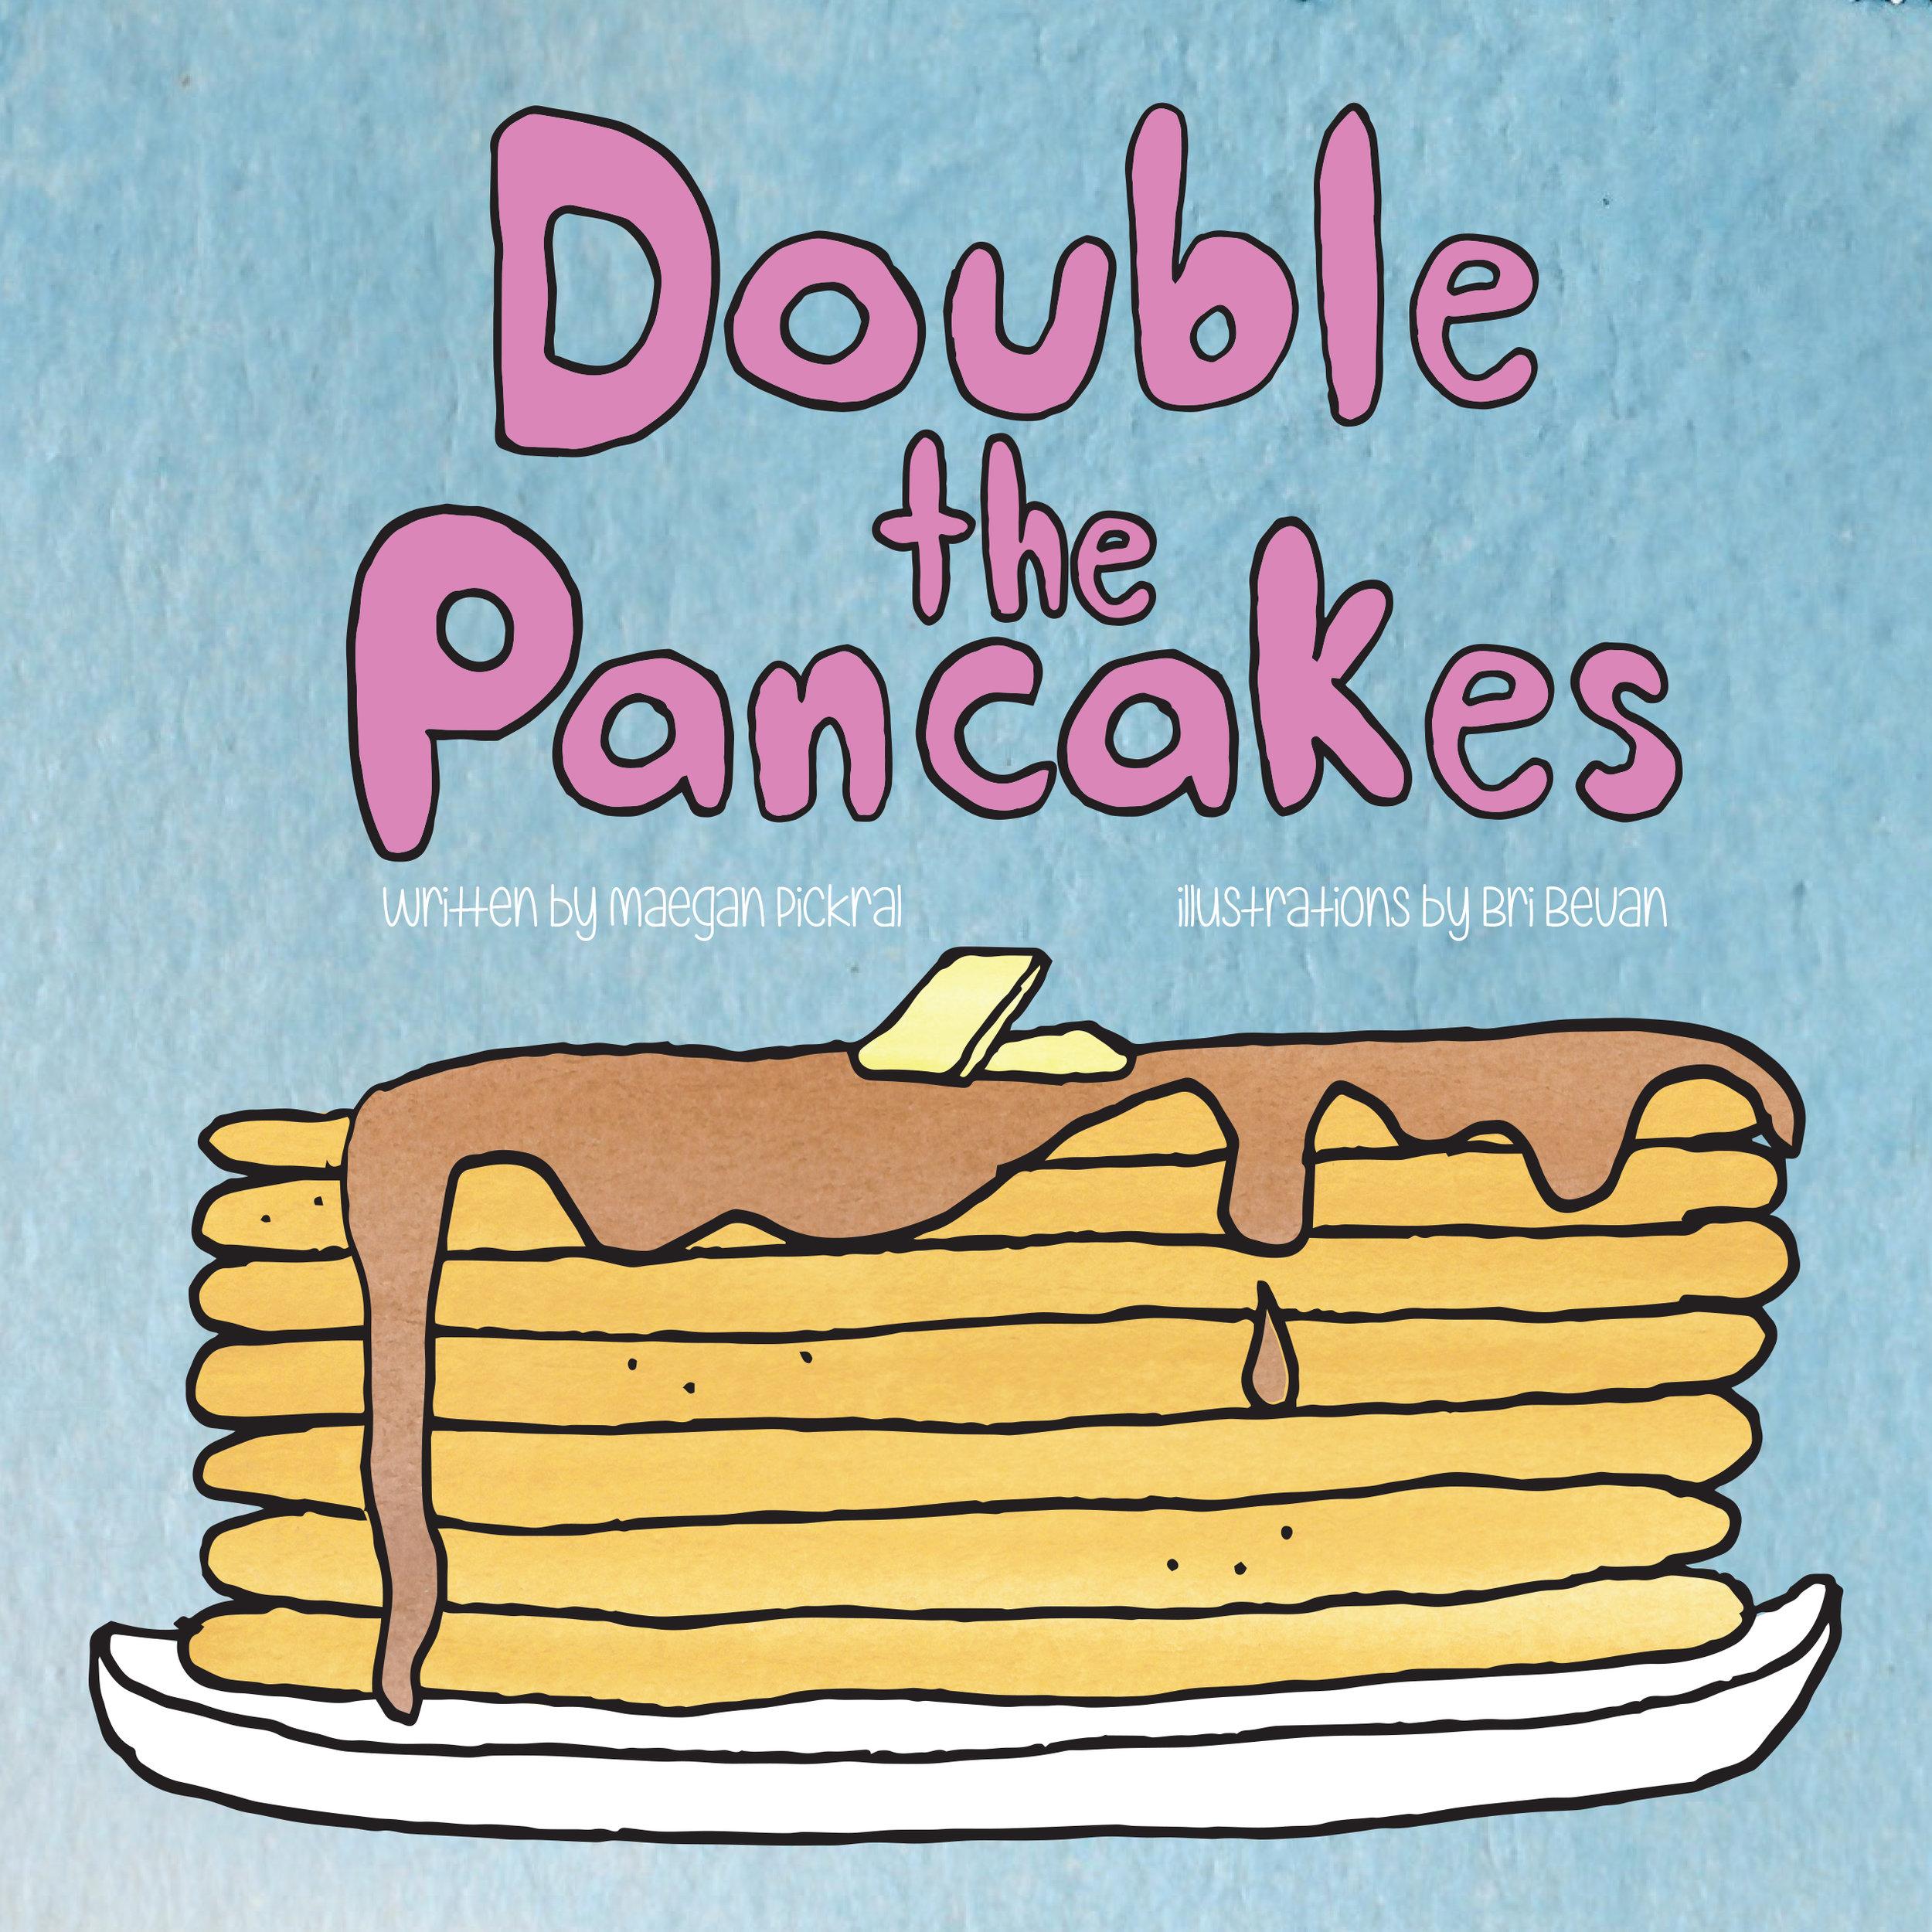 Double the Pancakes / Maegan Pickral & Bri Bevan